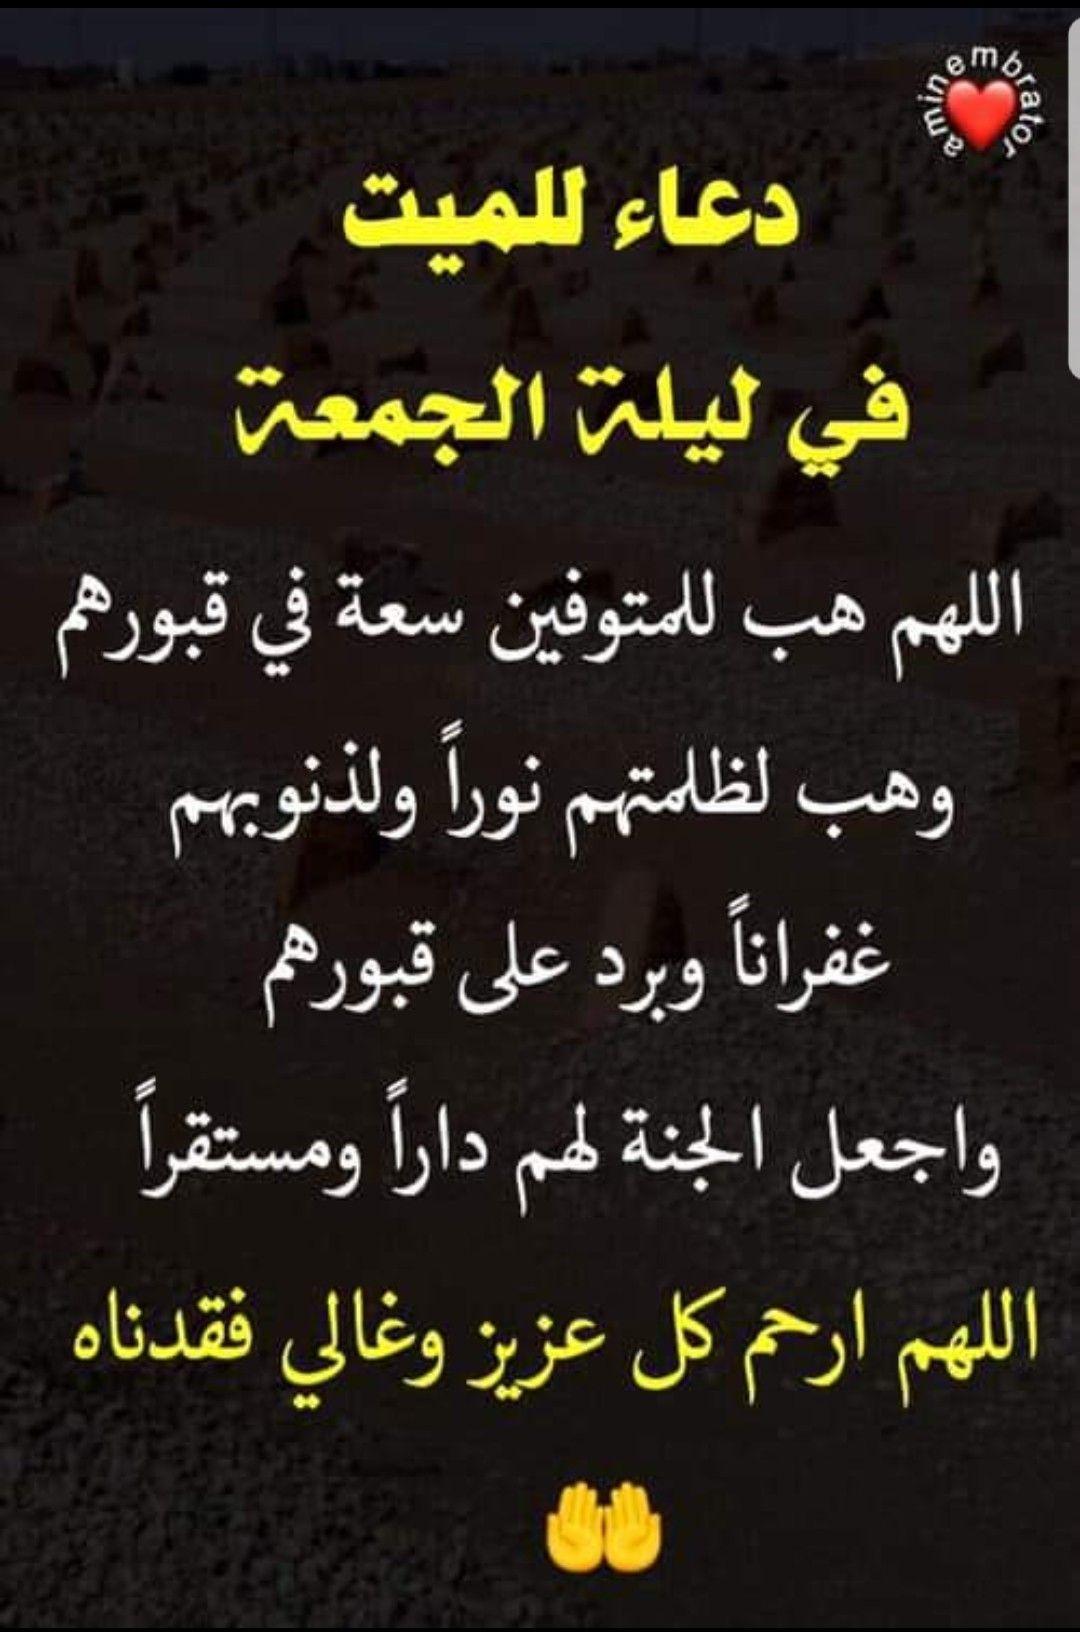 Pin By خليفه On اذكارات Quran Quotes Verses Quran Quotes Quotes